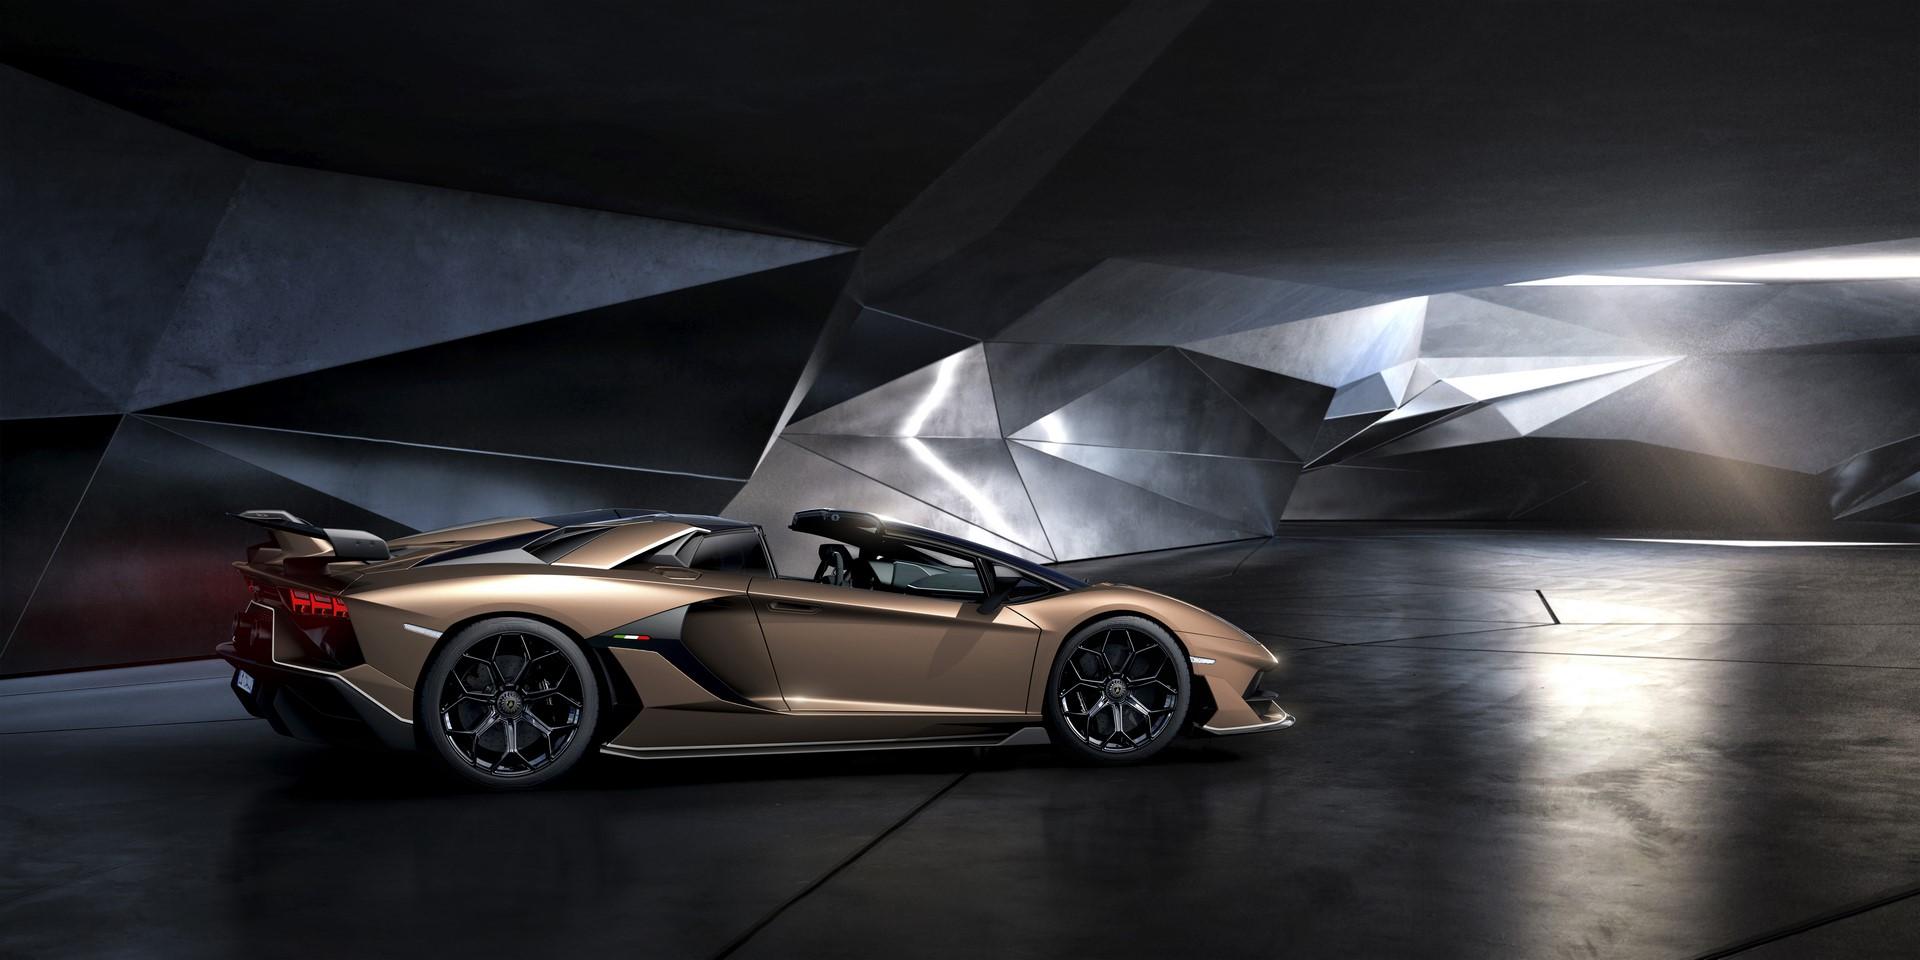 Lamborghini Aventador SVJ Roadster (11)